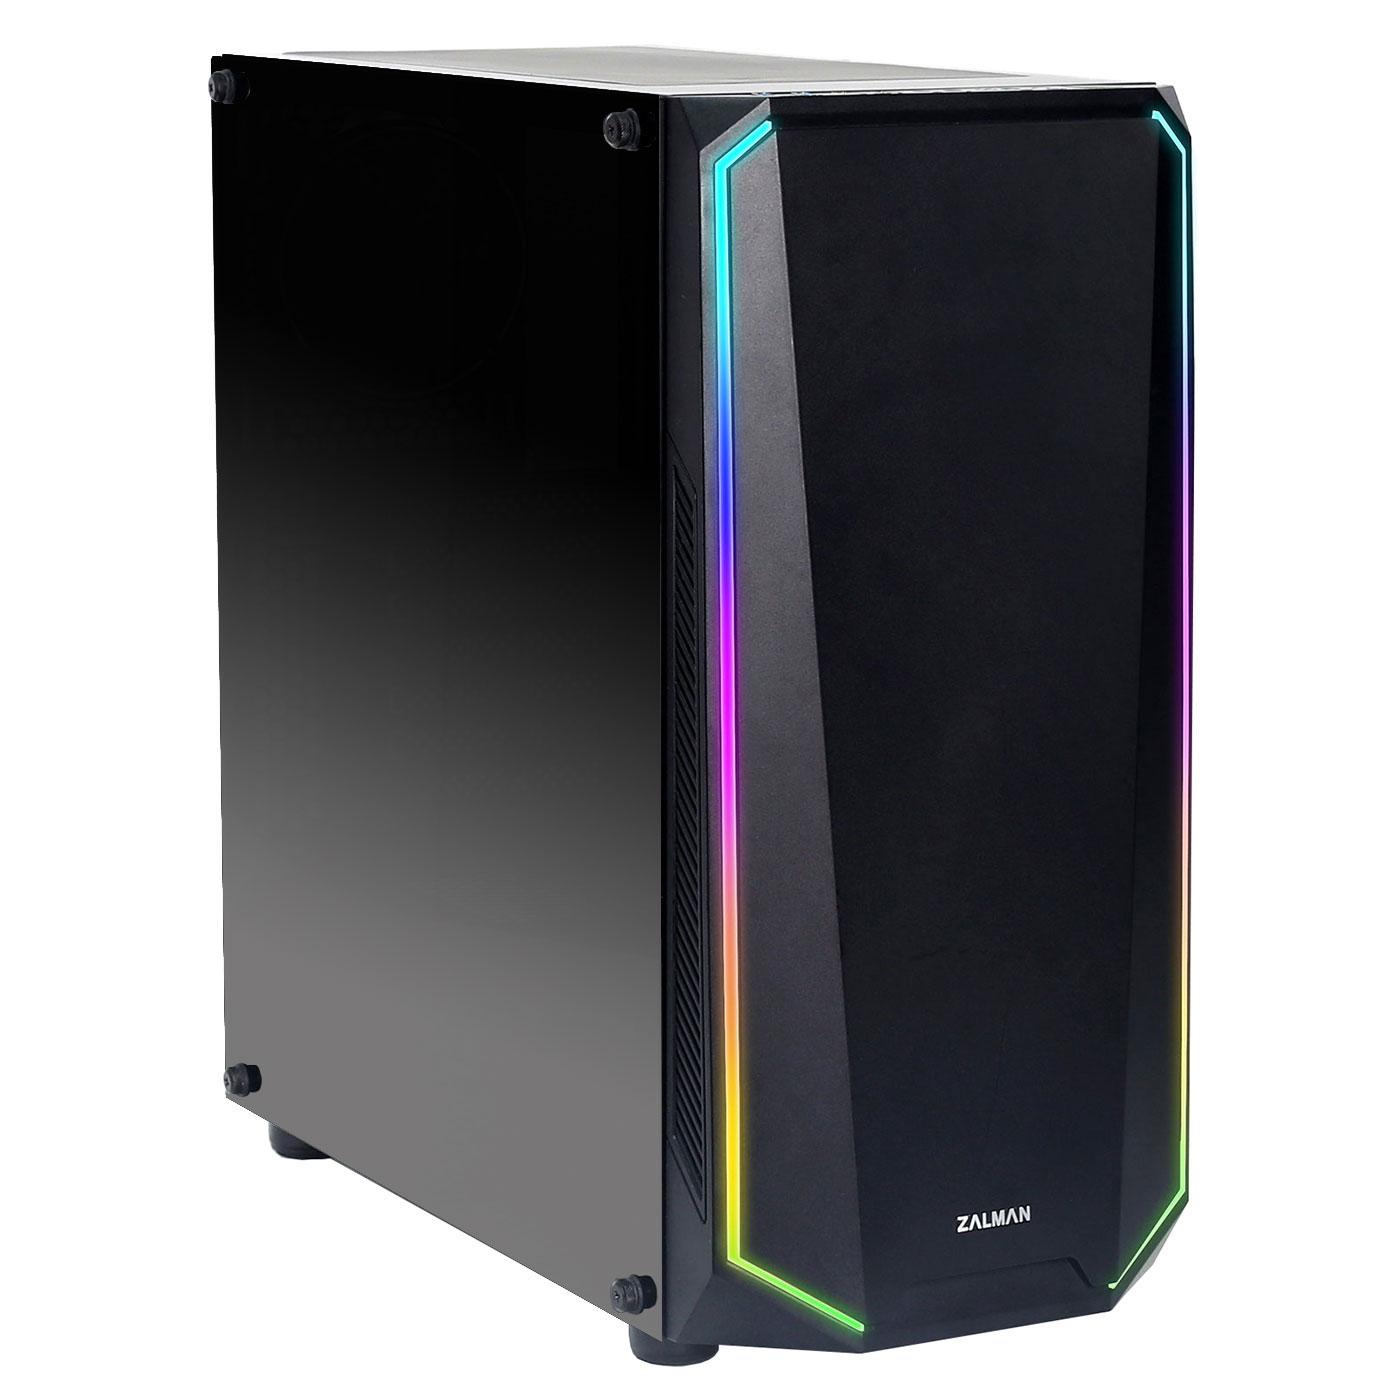 PC de bureau LDLC PC Alpha AMD Ryzen 5 2600 (3.4 GHz) 8 Go SSD 240 Go + HDD 1 To AMD Radeon RX 580 8Go (sans OS - monté)